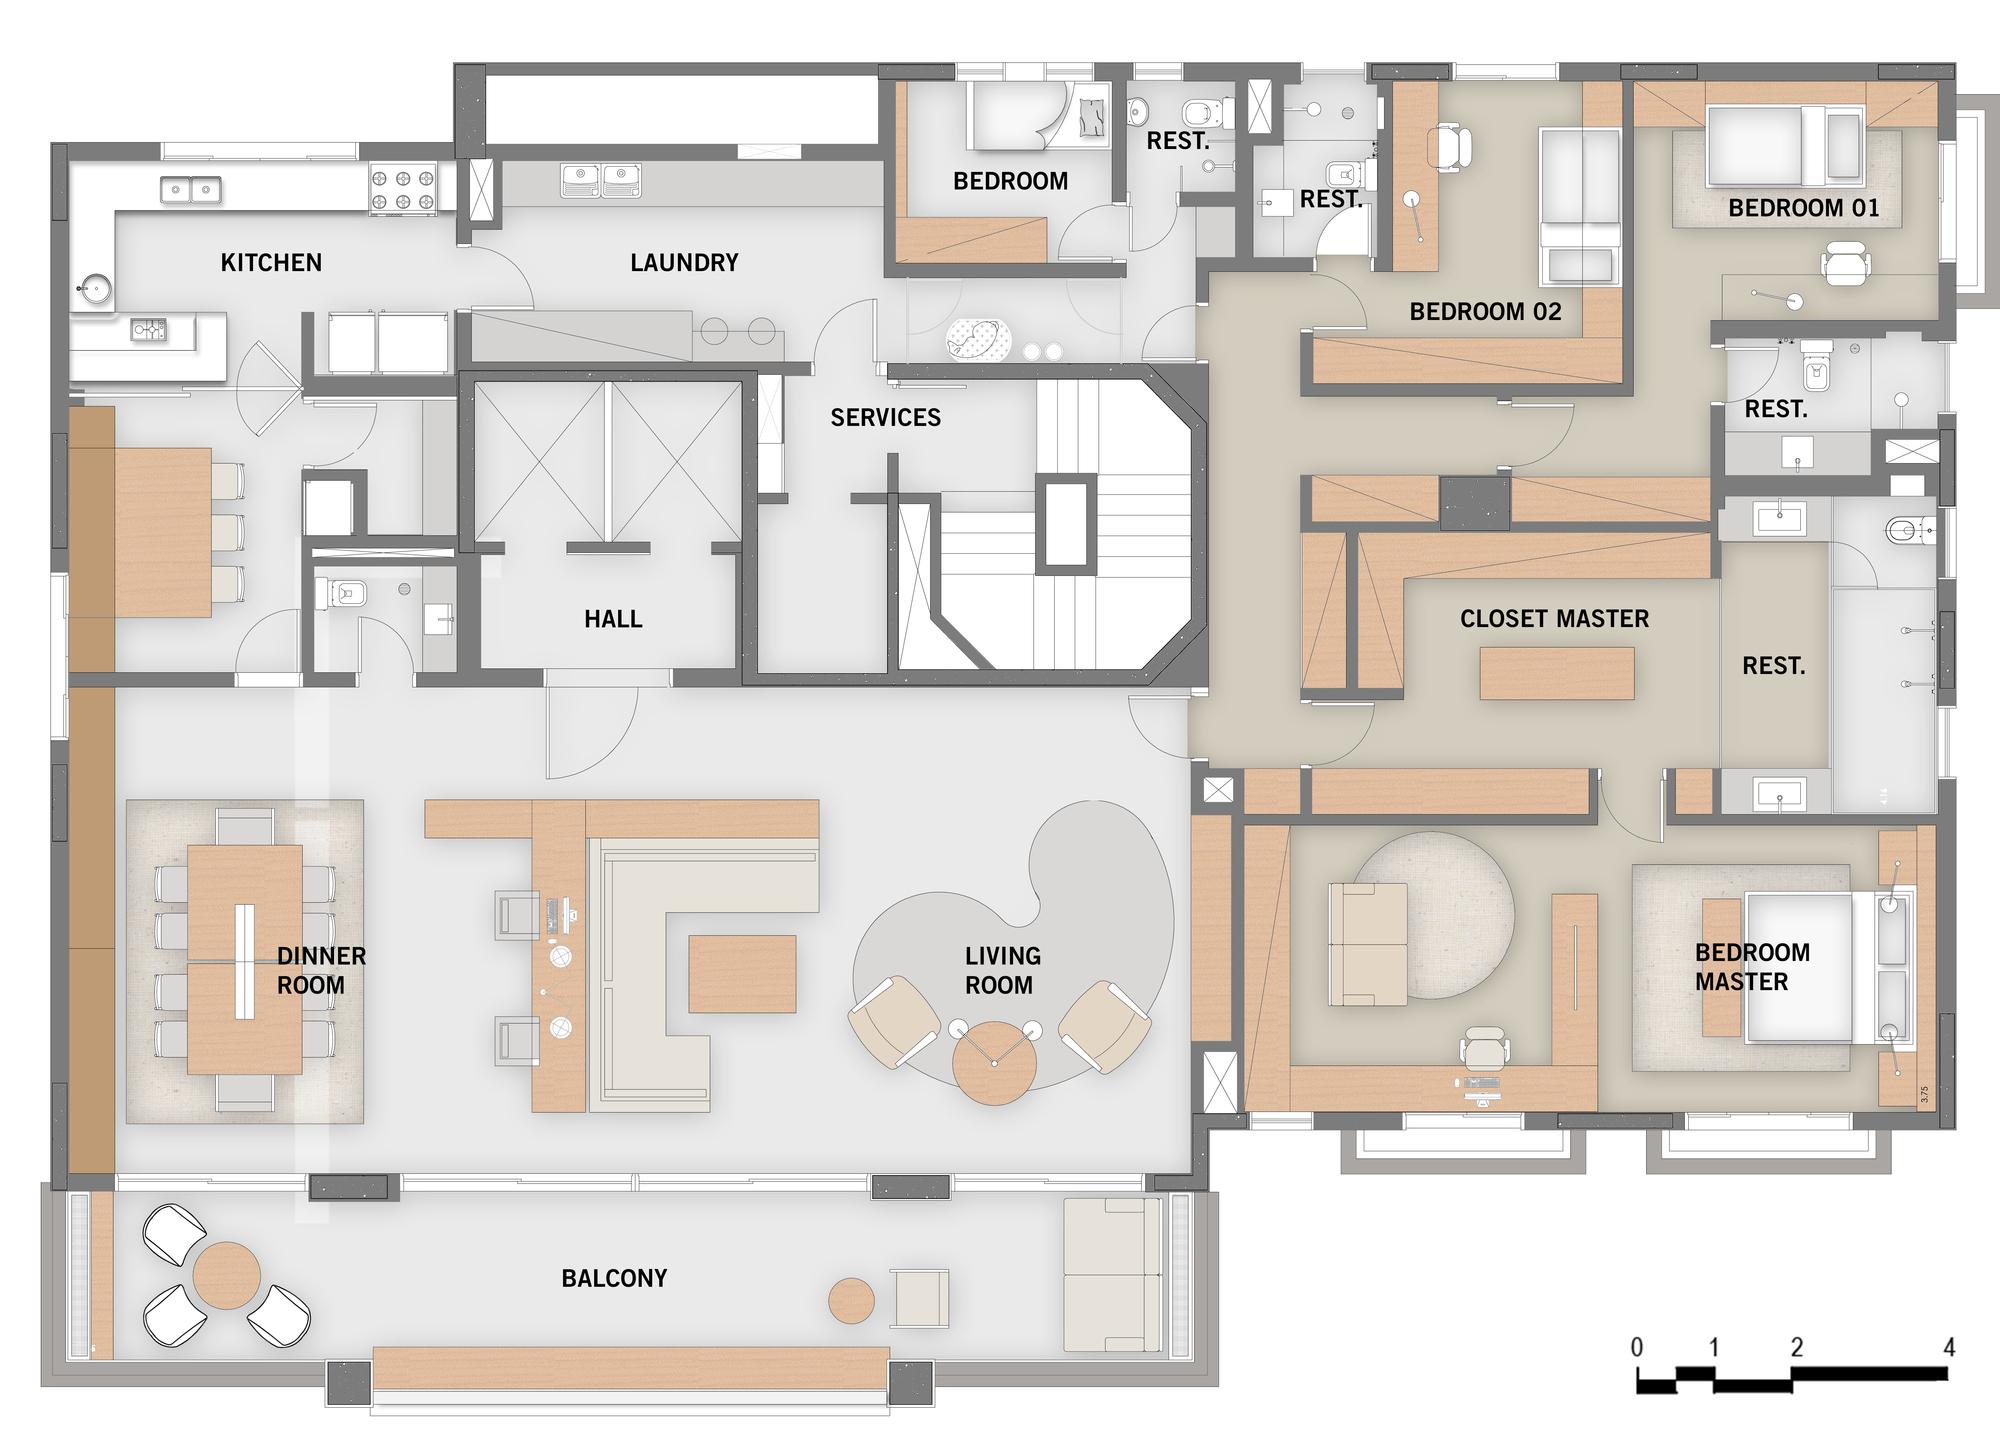 Galeria de apartamento jardim europa perkins will 20 for Maison moderne de luxe plan